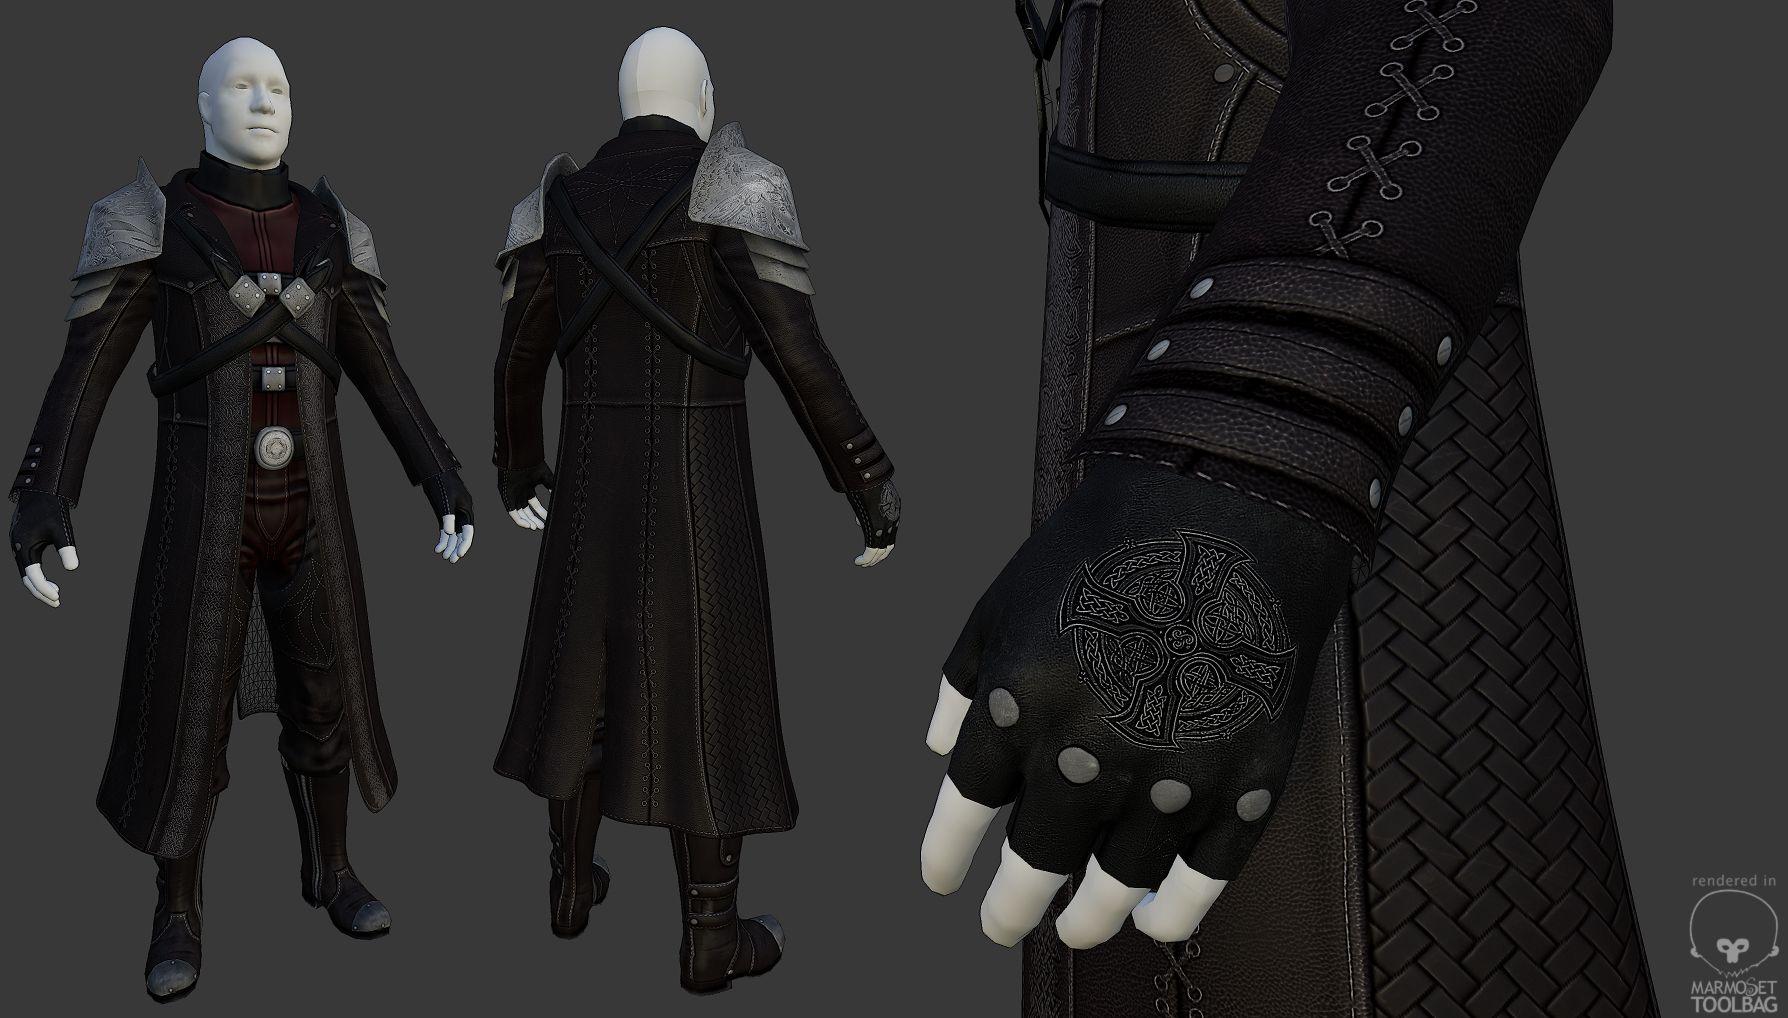 skyrim tunic mods - Google Search   RPG IDEAS   Skyrim armor, Skyrim